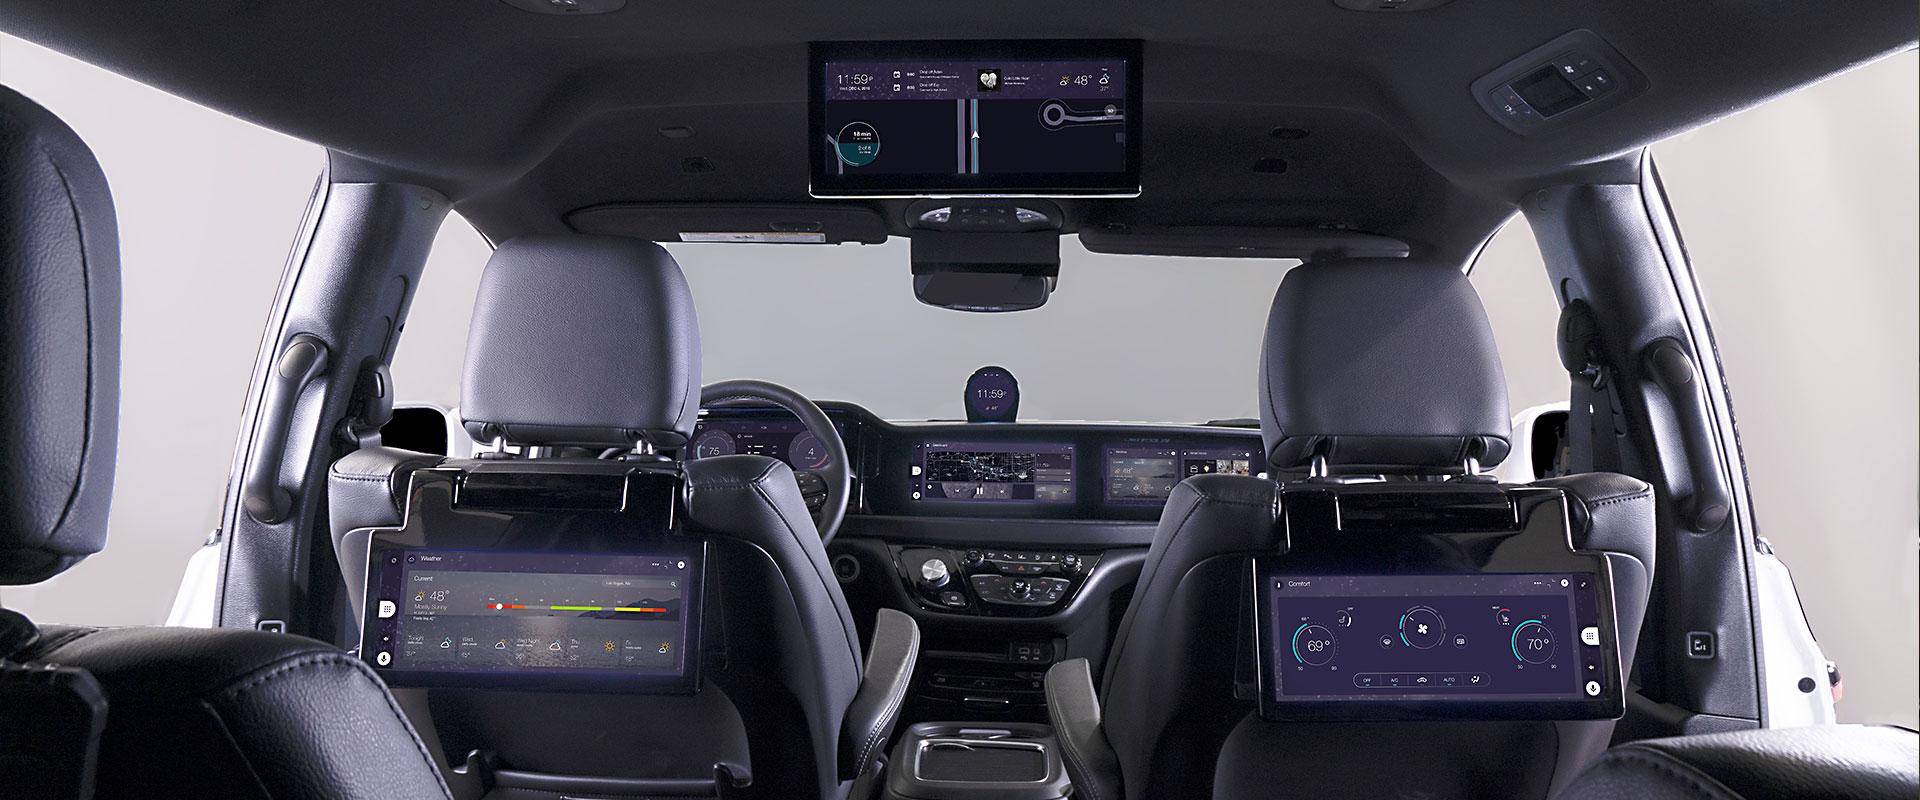 flexconnect.maas interior